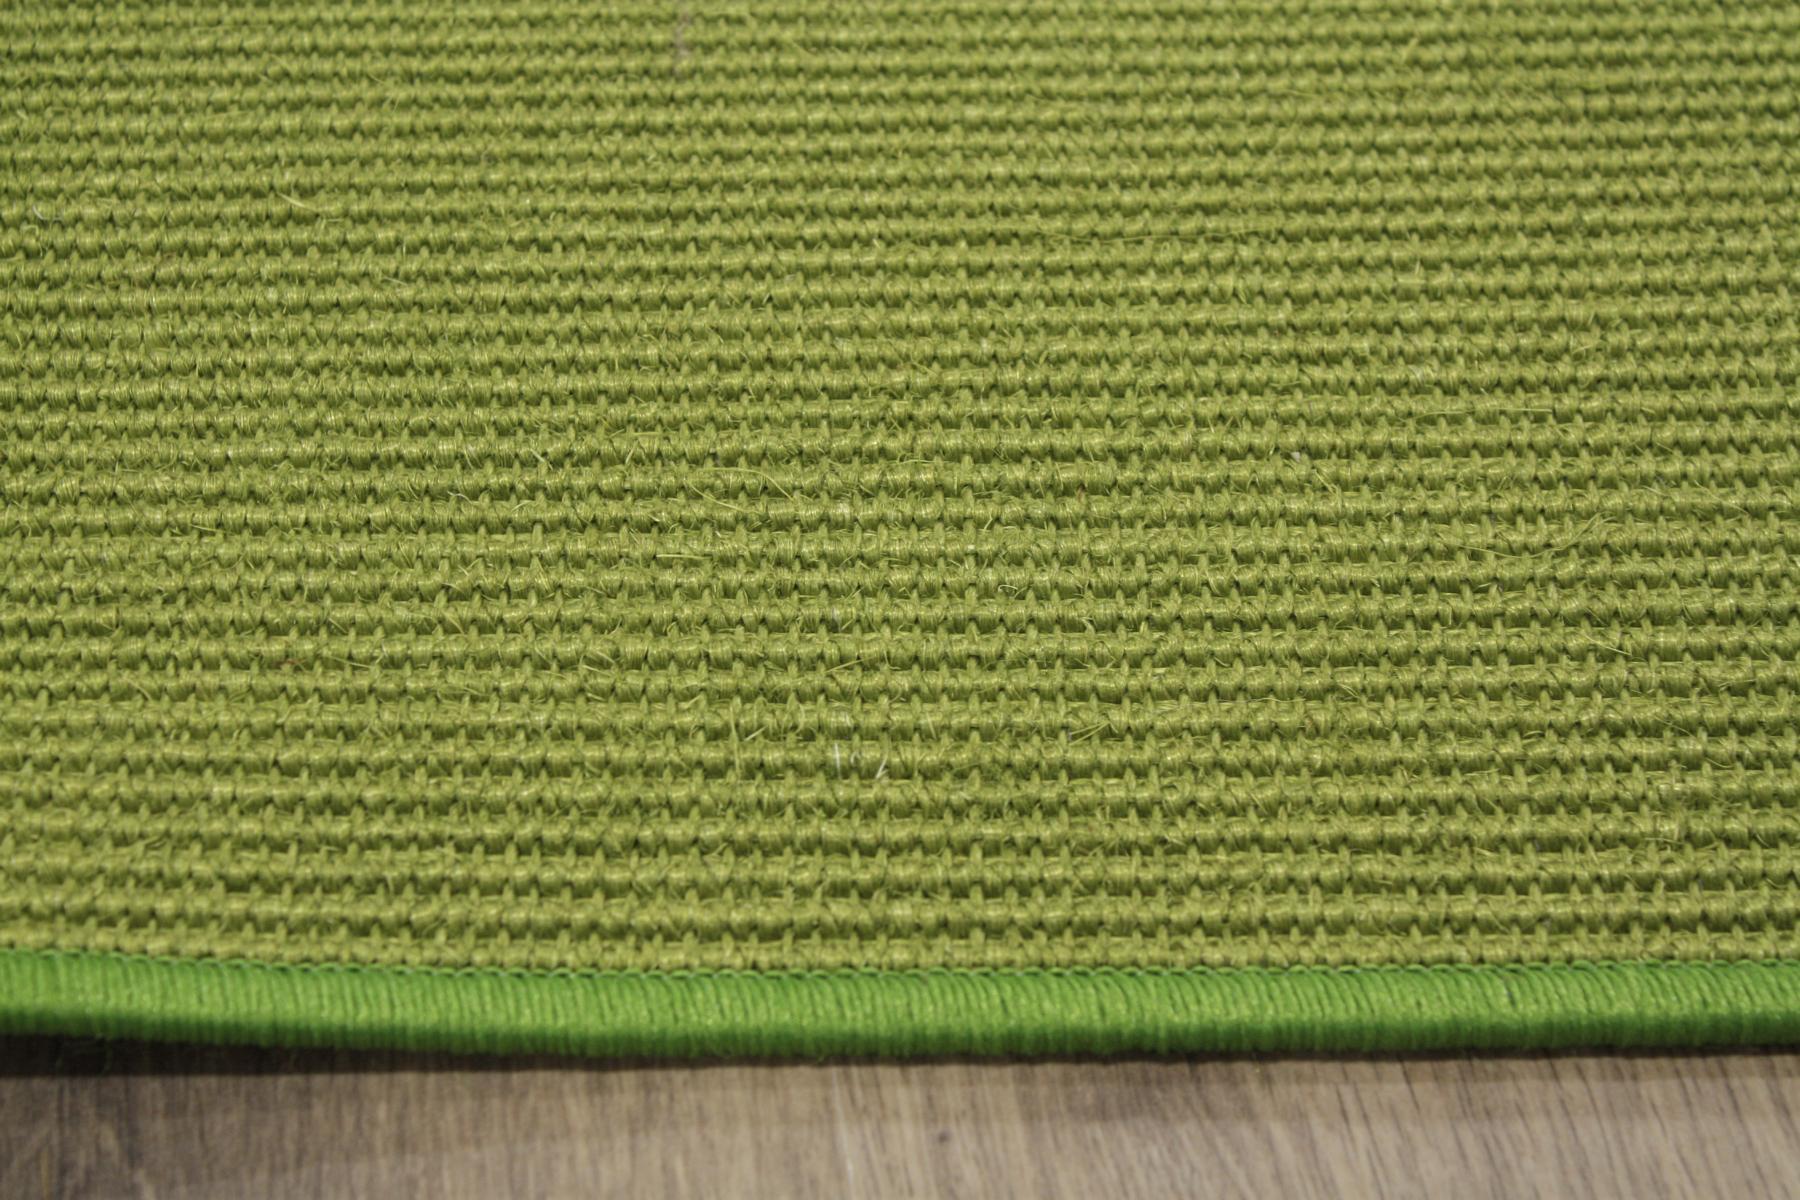 sisal teppich umkettelt gr n 120x180cm 100 sisal gekettelt. Black Bedroom Furniture Sets. Home Design Ideas